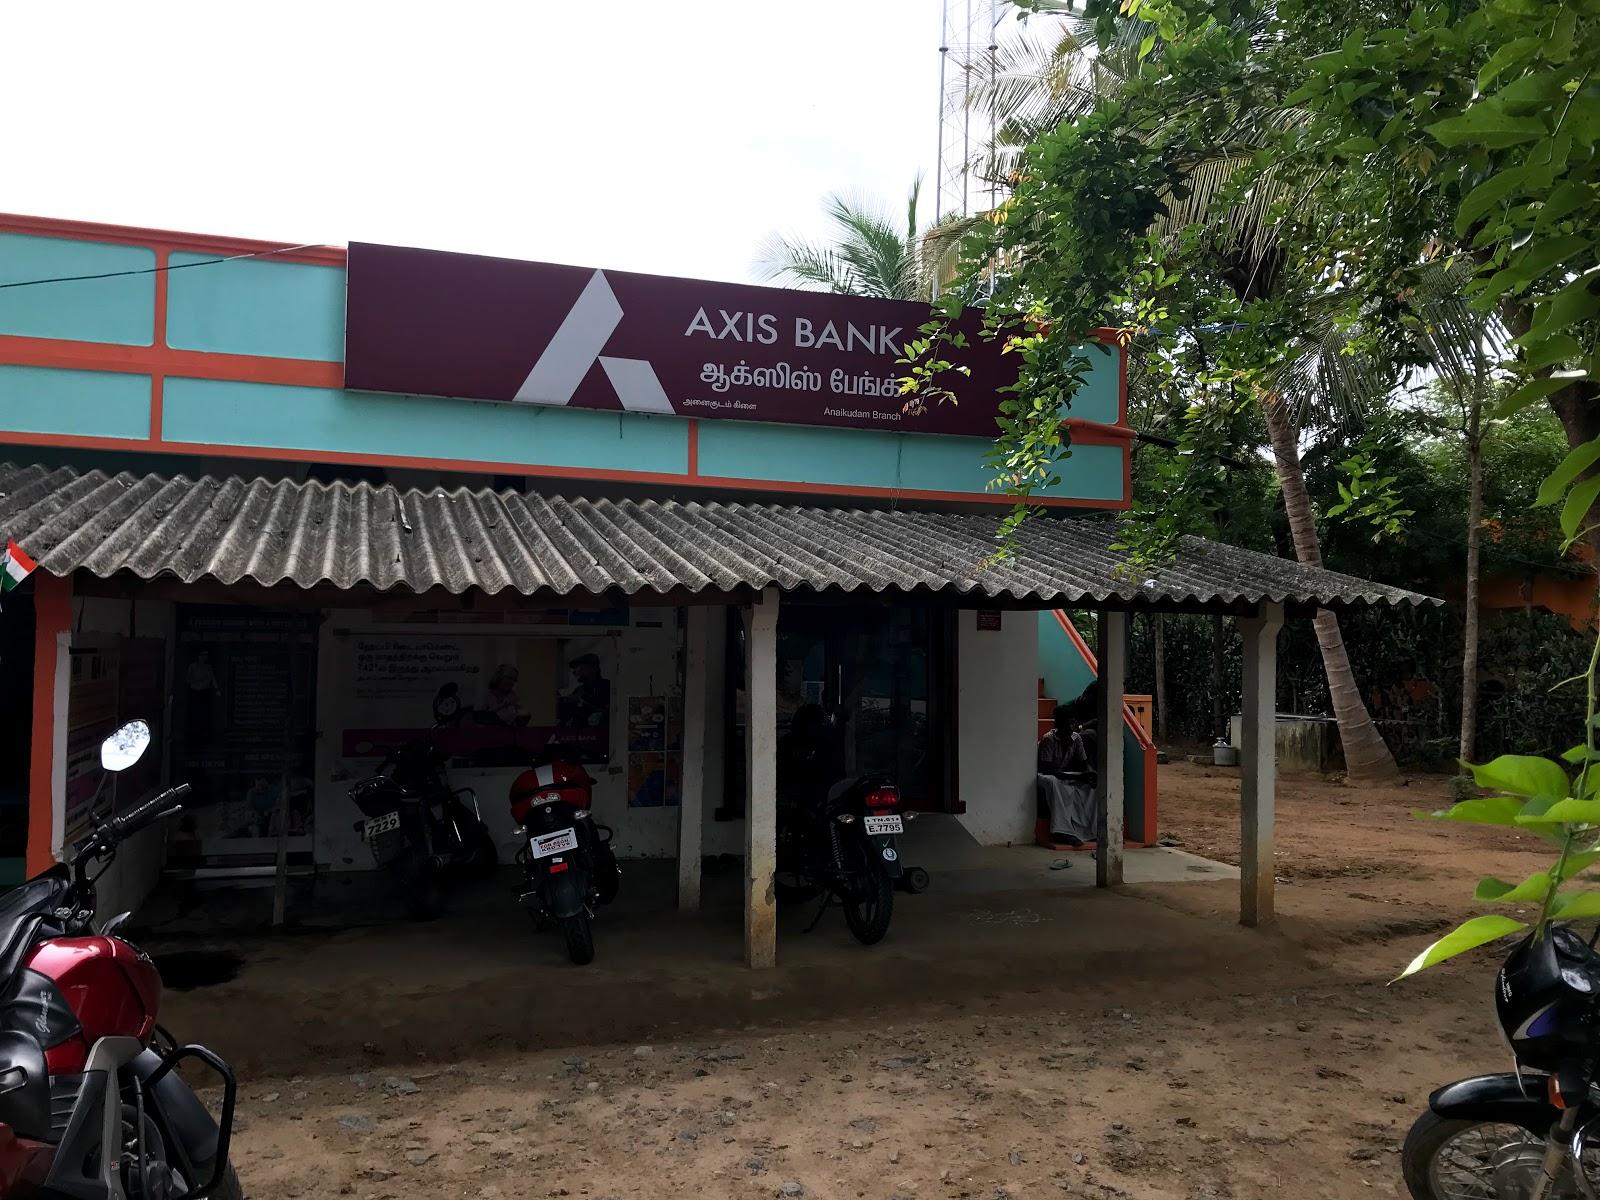 blood bank Axis Bank near Jayankondam Tamil Nadu